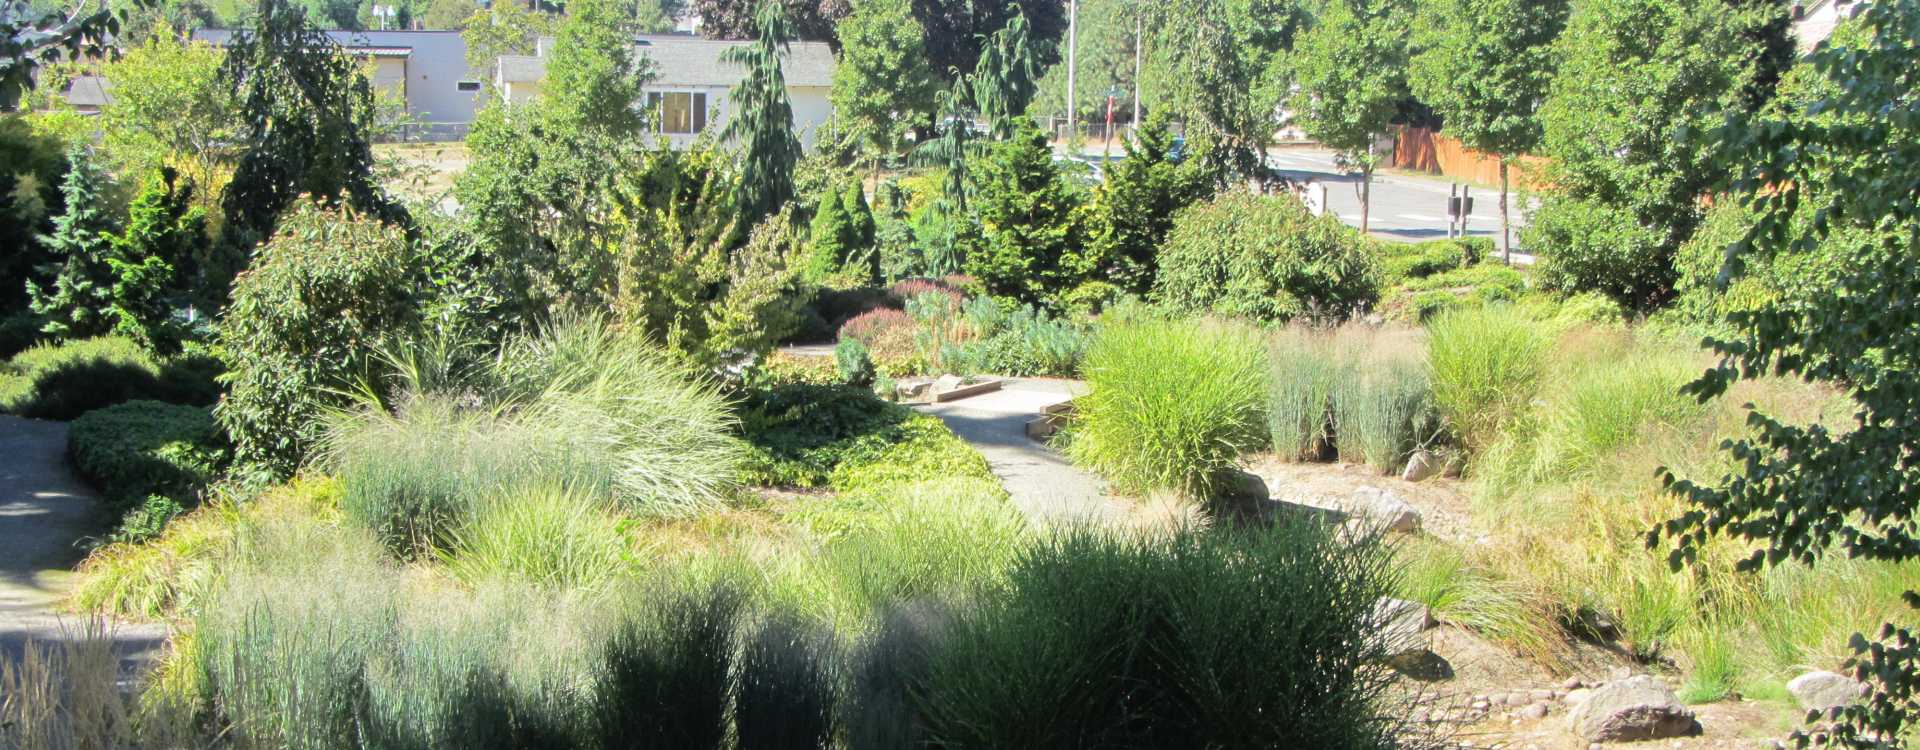 Macadam Winter Garden